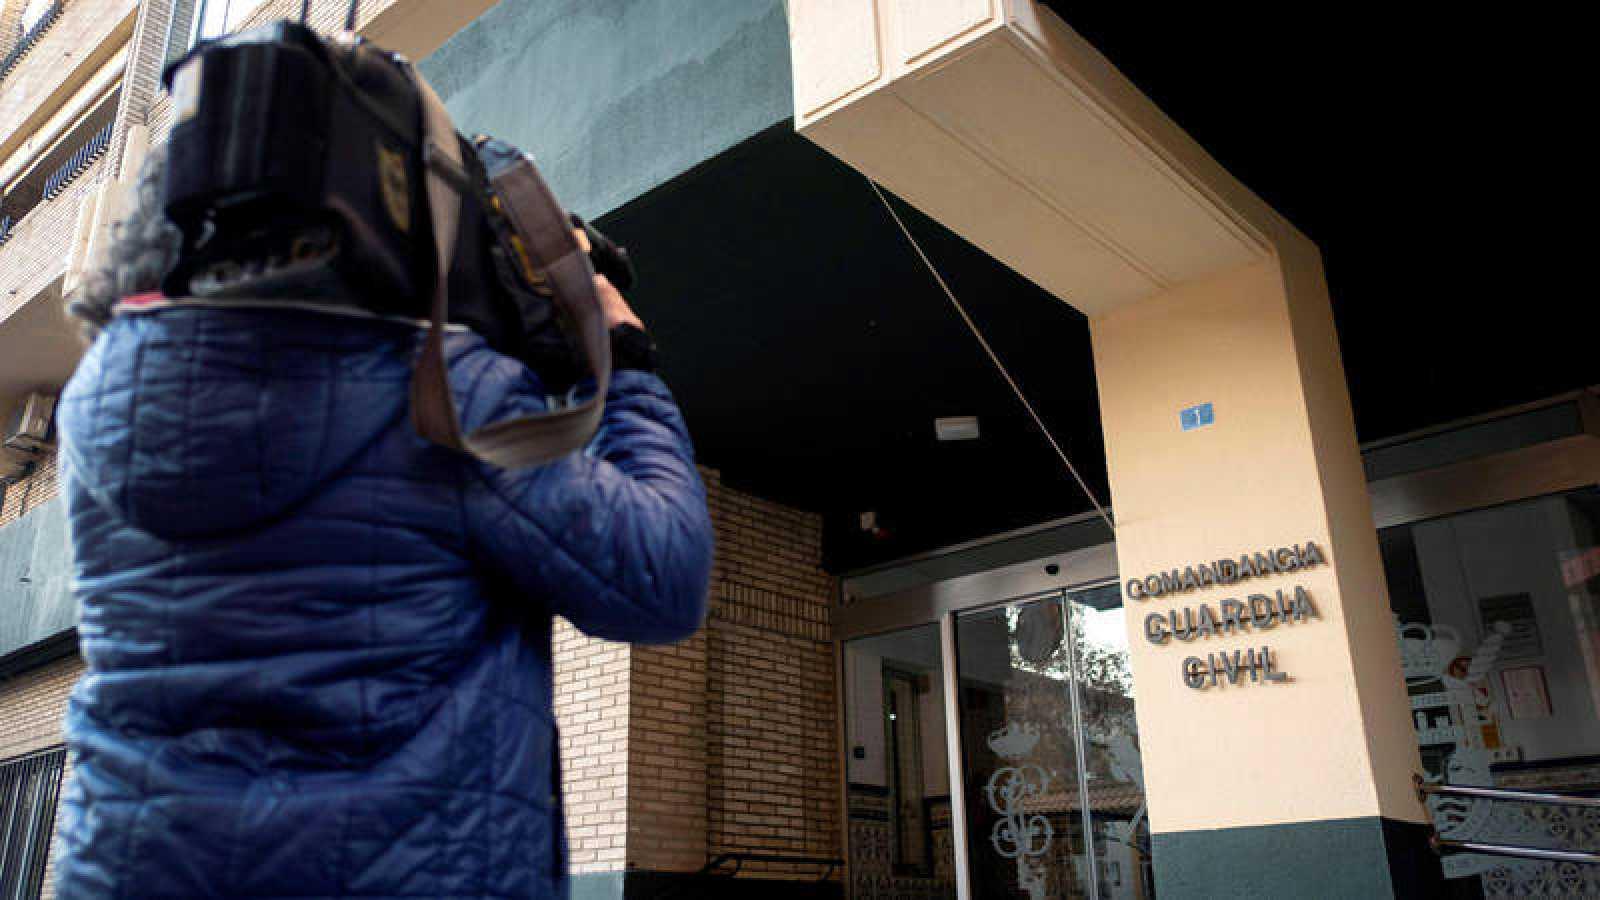 Imagen de las puertas de la Comandancia de la Guardia Civil de Huelva